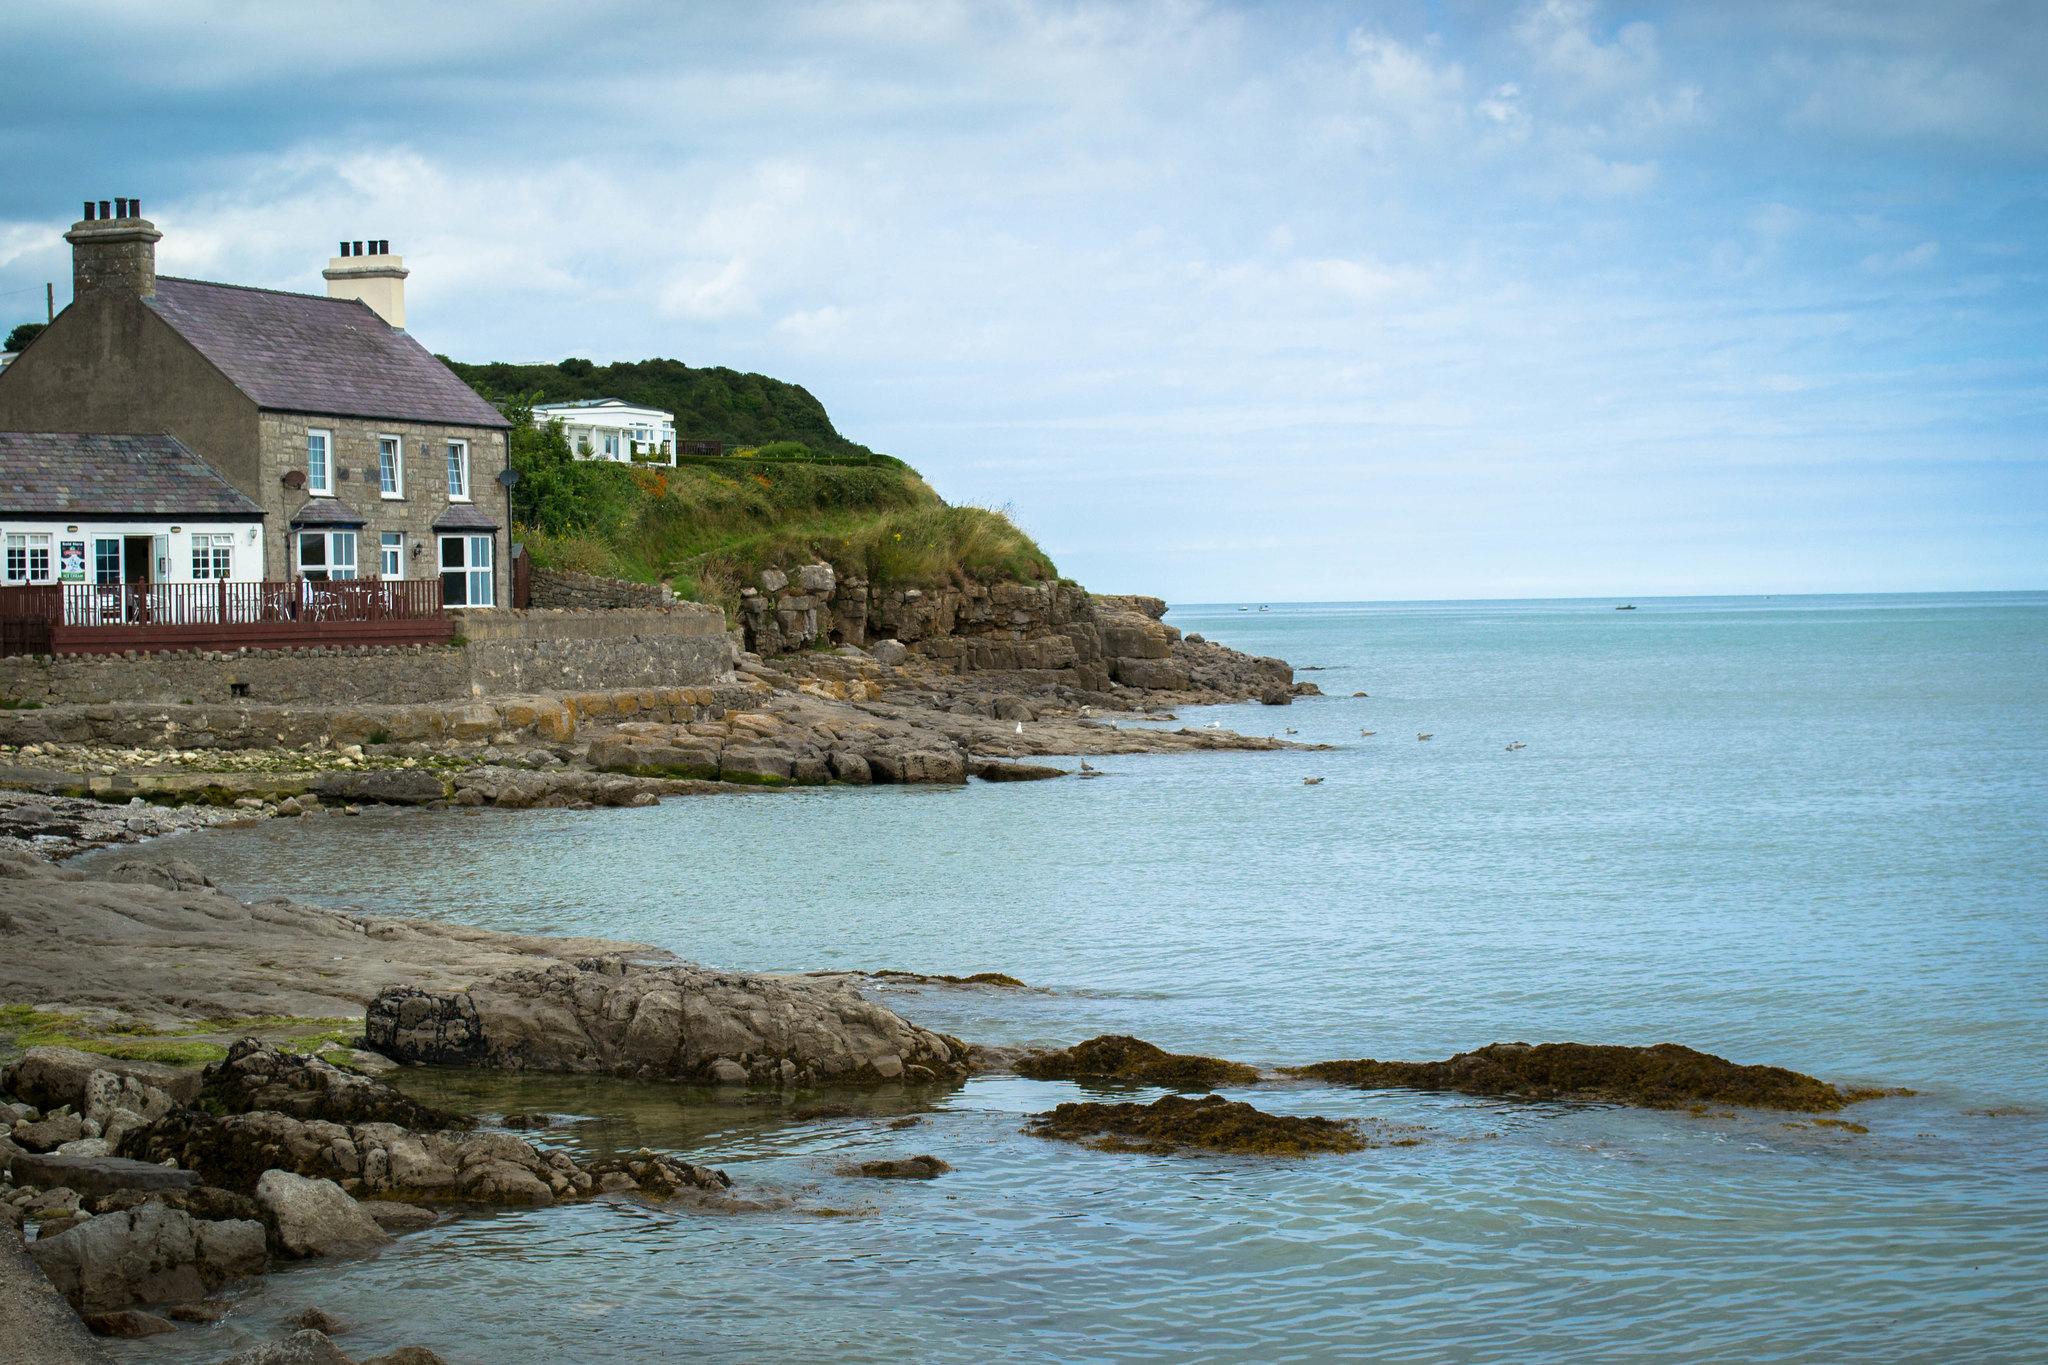 Benllech, Anglesey